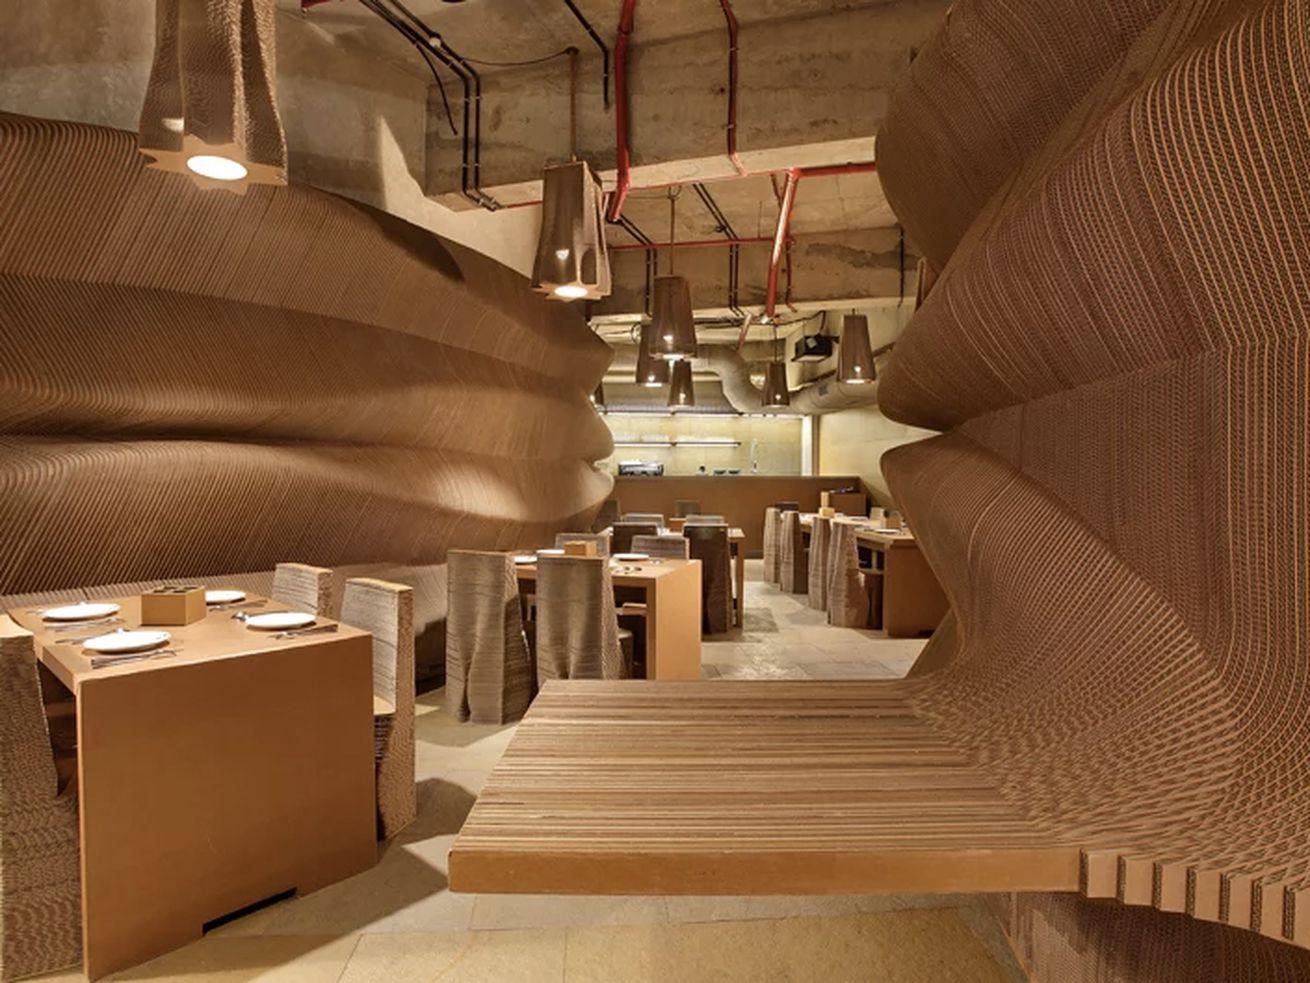 Inside a cafe made of cardboard